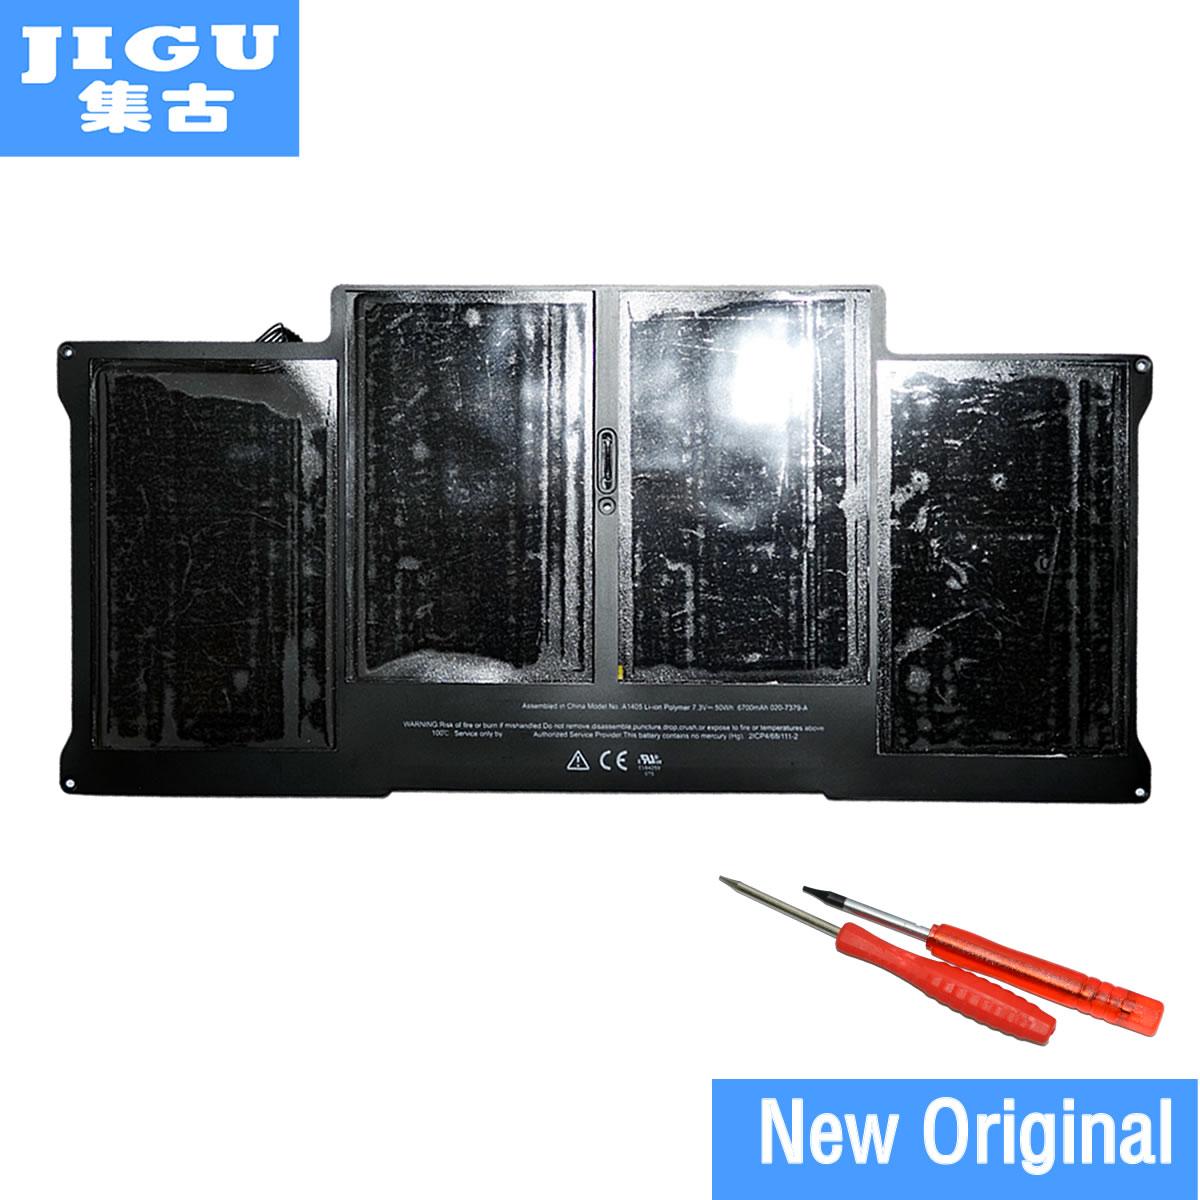 Jigu Фирменная Новинка оригинальными Батарея a1405 для MacBook Air 13 &#8220;A1369 MID 2011 <font><b>A1466</b></font> MID 2012, оснащен двумя отвертки